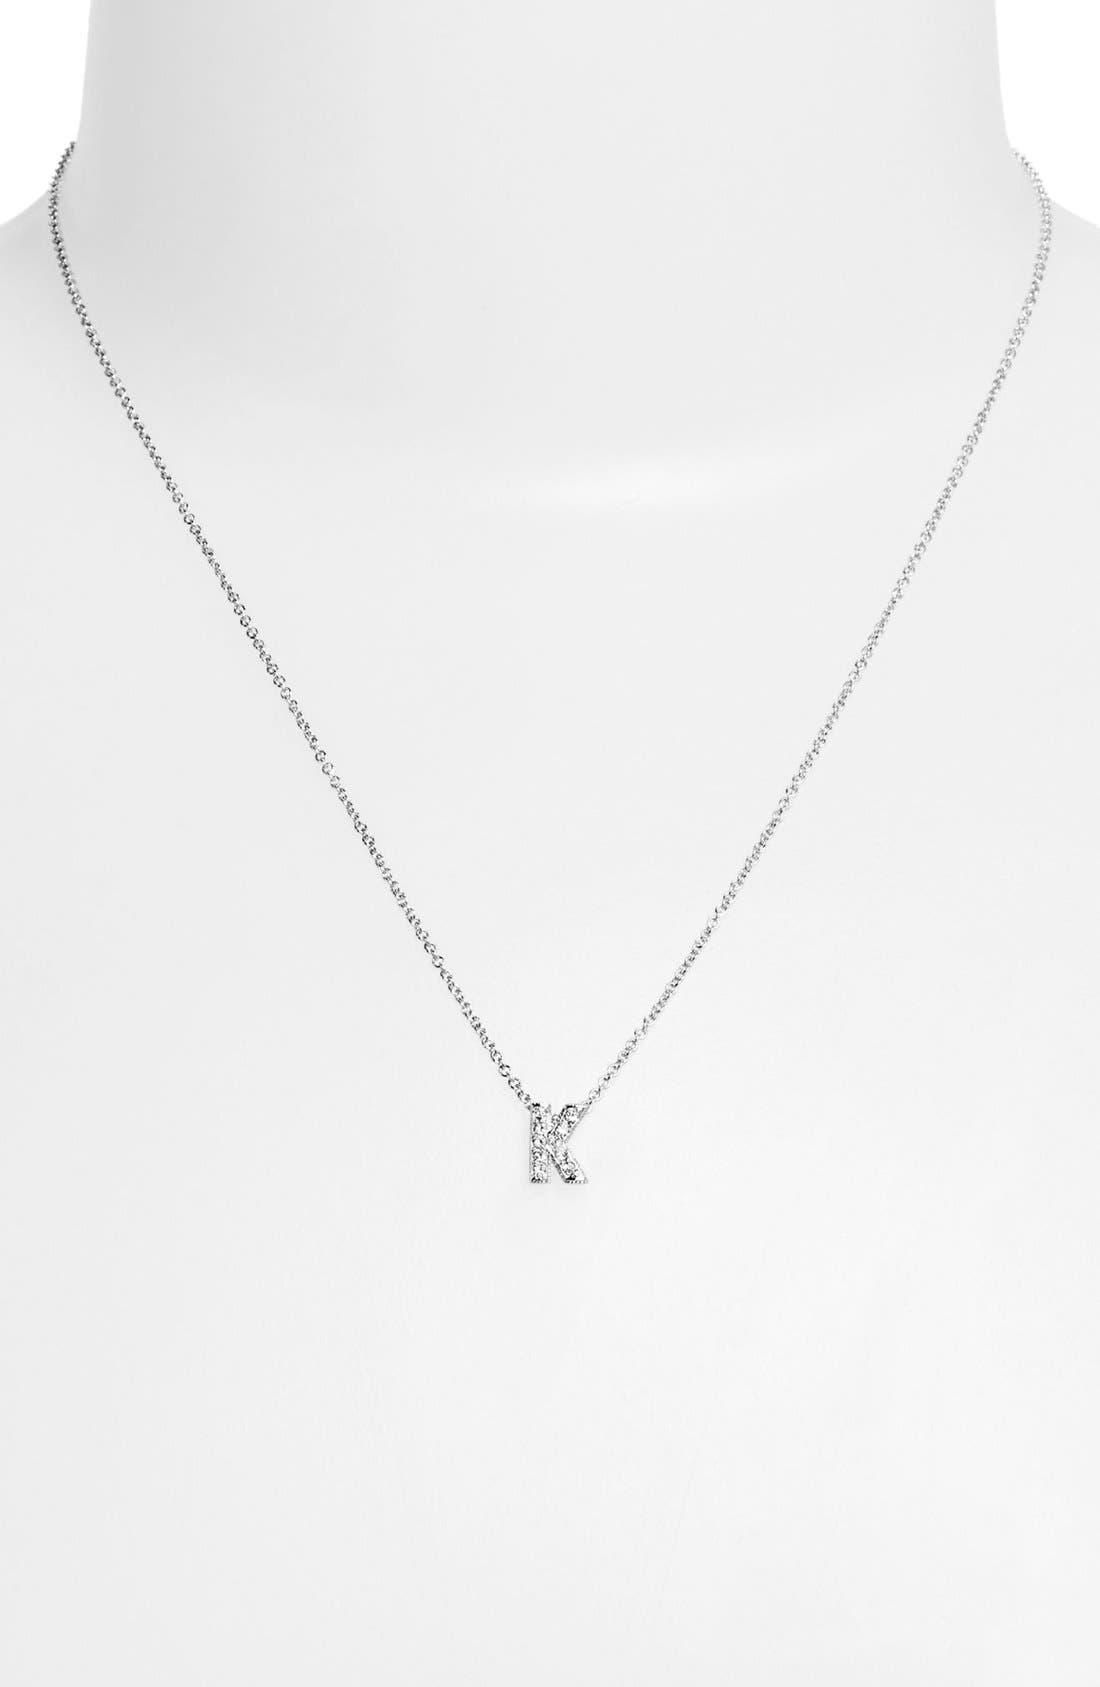 Alternate Image 1 Selected - Nadri Boxed Initial Pendant Necklace